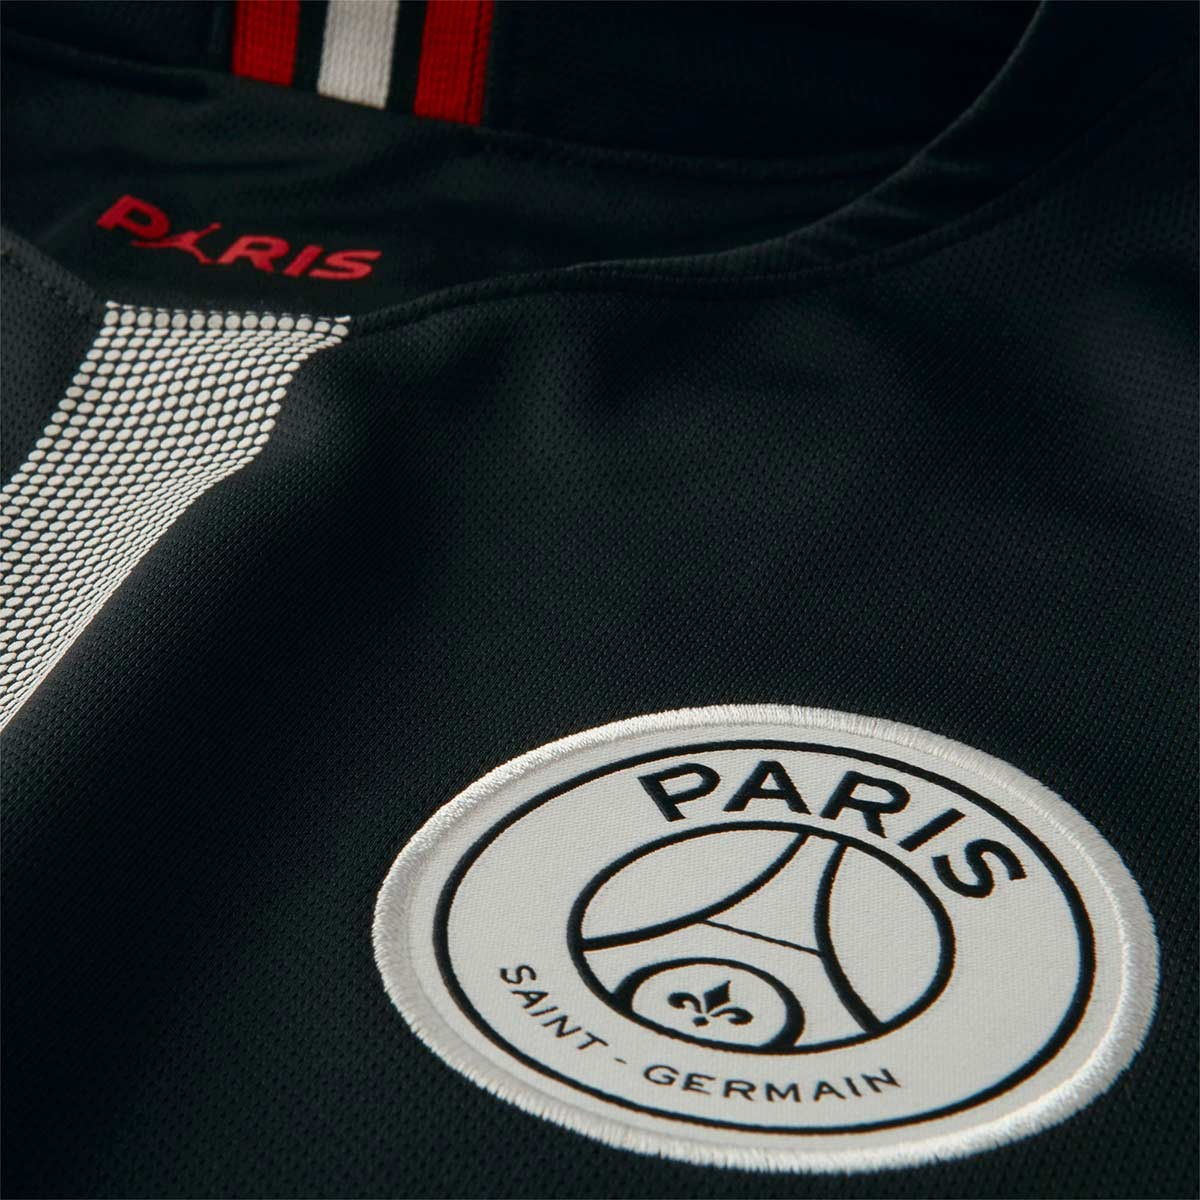 Jersey Nike Paris Saint-Germain Stadium SS Tercera Equipación 2018-2019  Black-White - Soloporteros es ahora Fútbol Emotion 7629c7ab06908